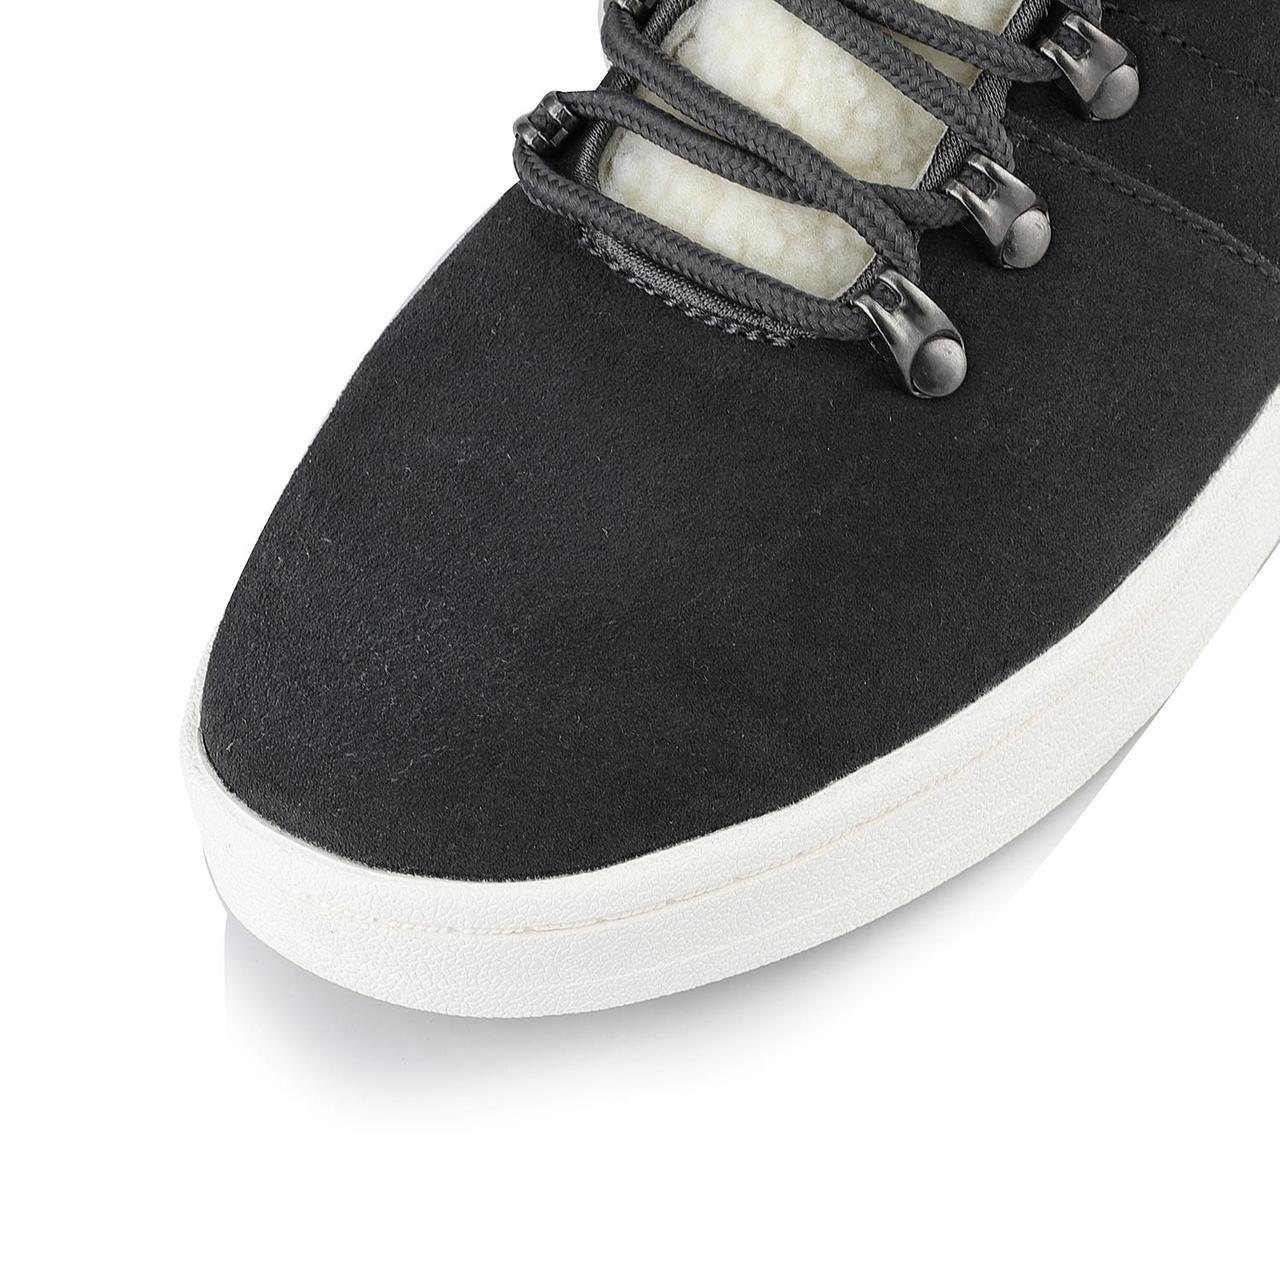 Ботинки MANDELTNA - фото 5